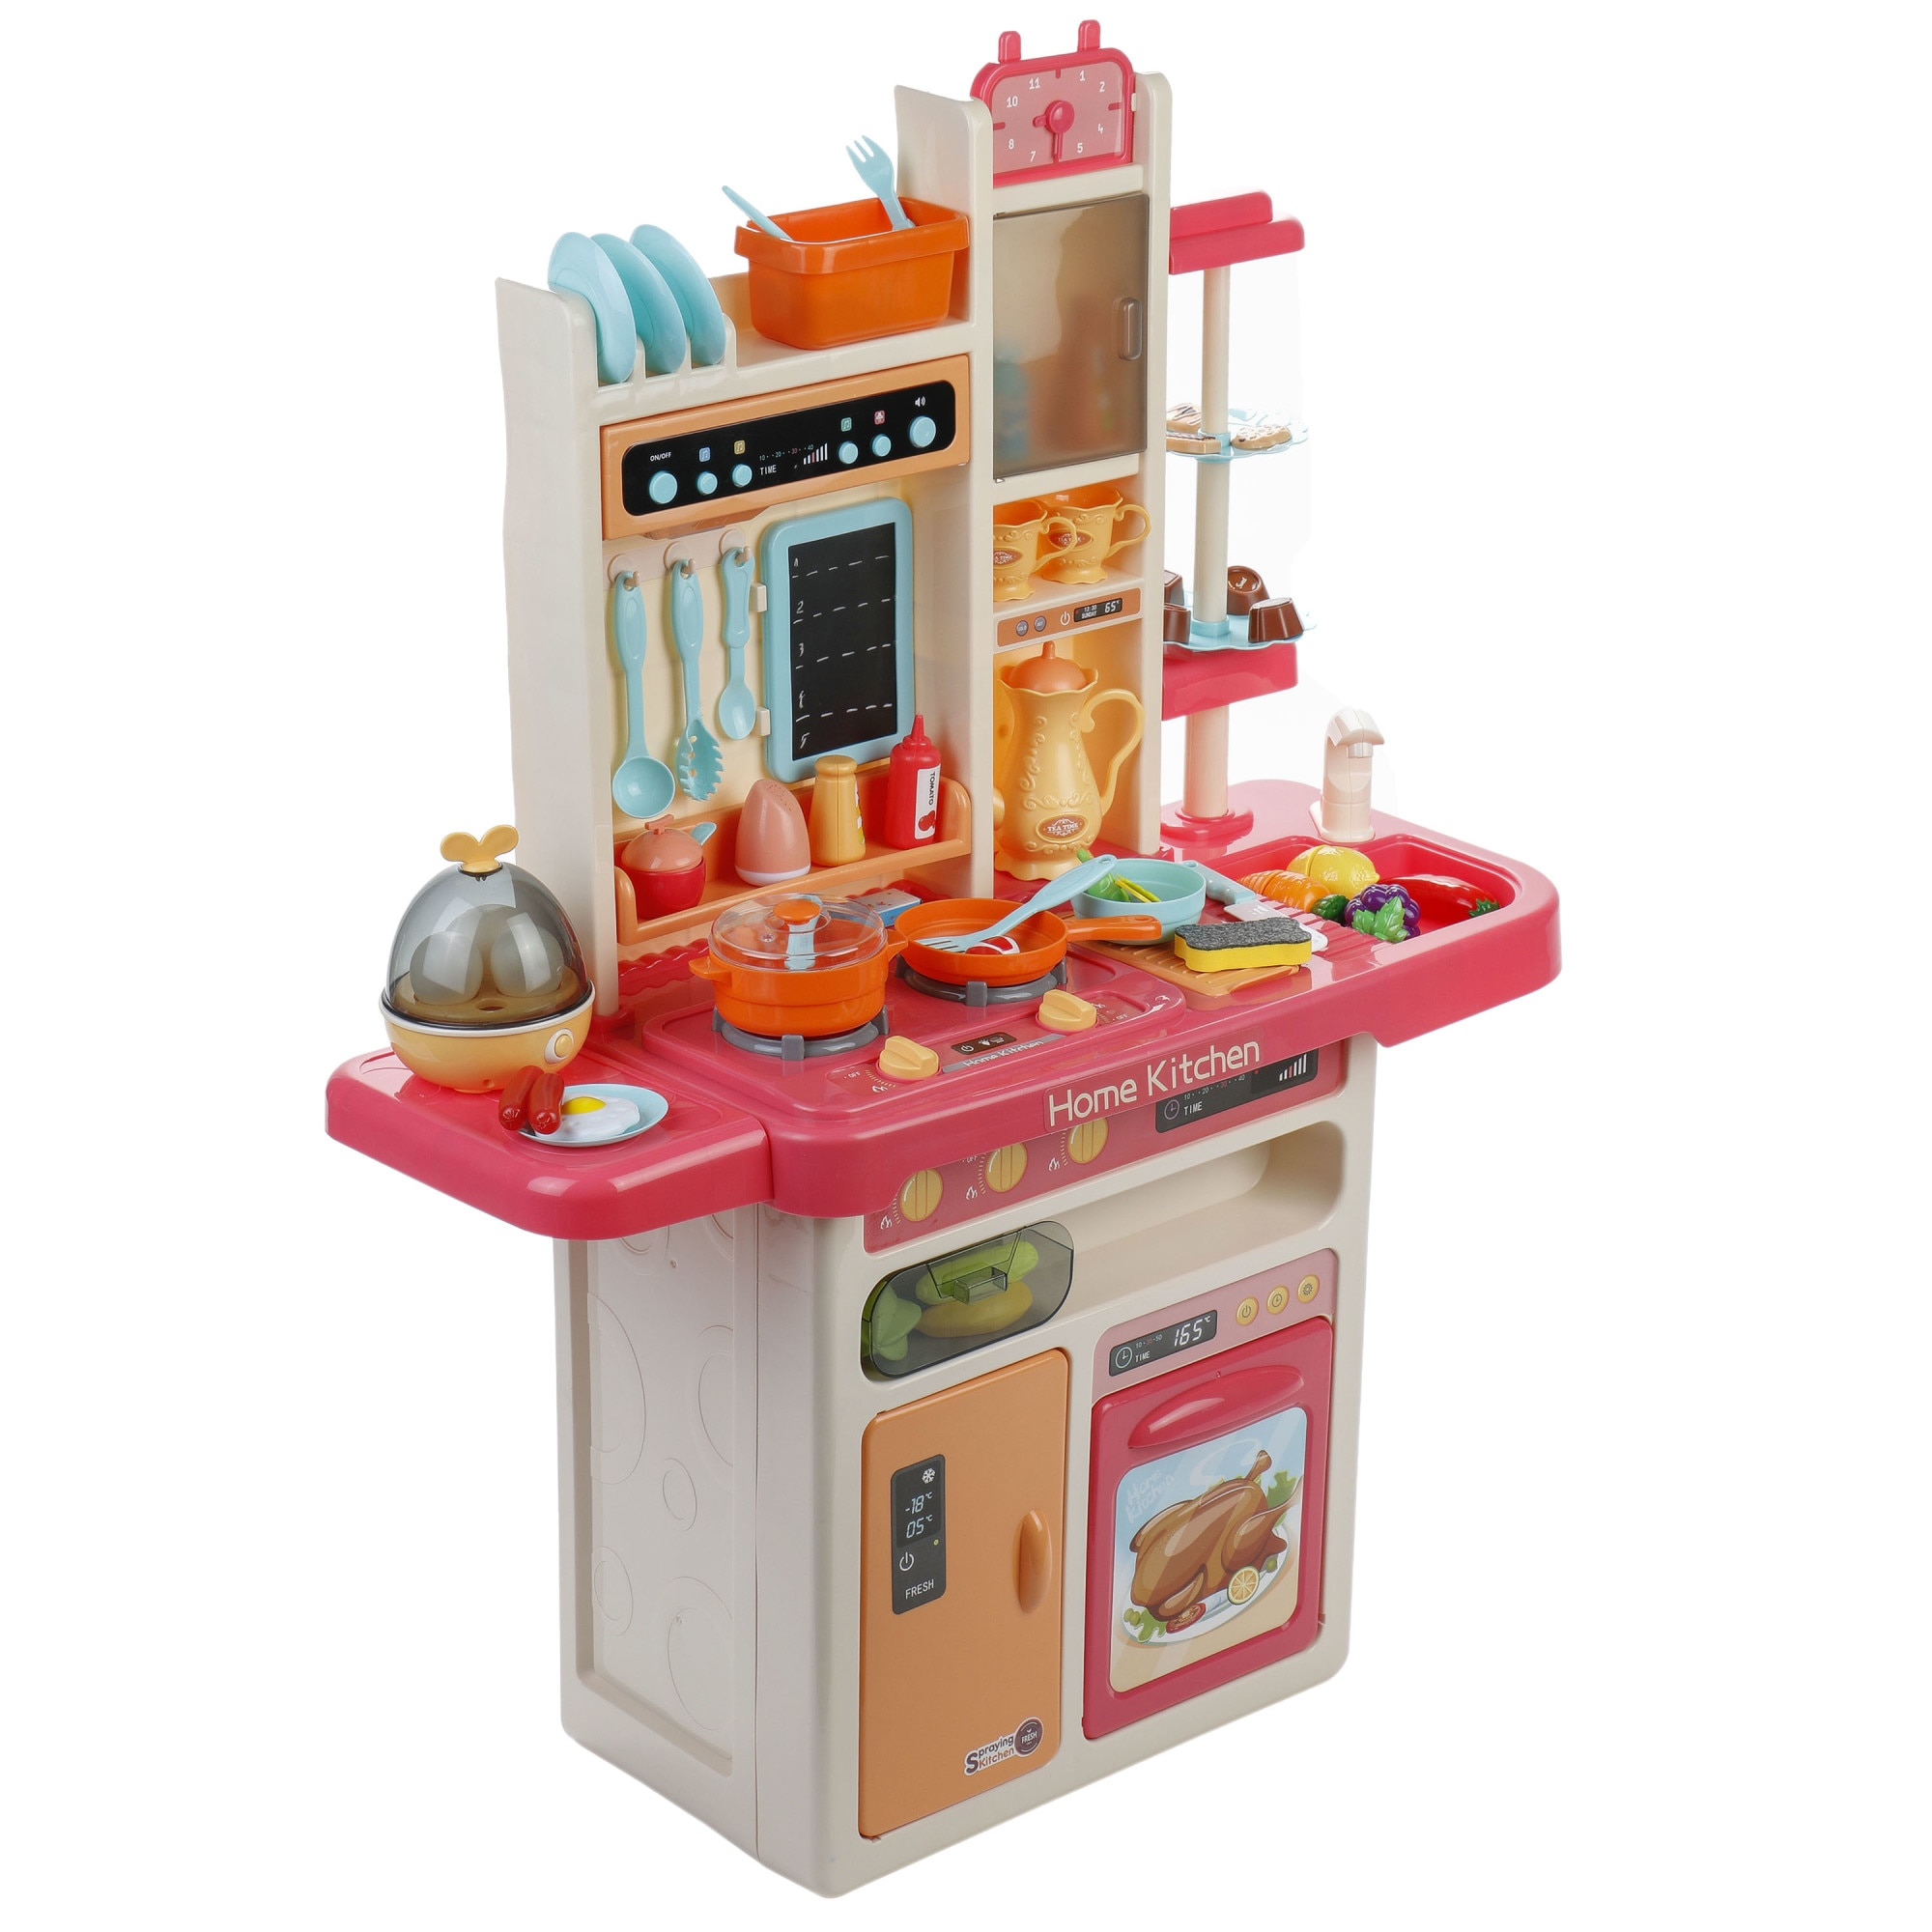 Fotografie Bucatarie M-Toys cu 65 accesorii, lumini si sunet, Roz